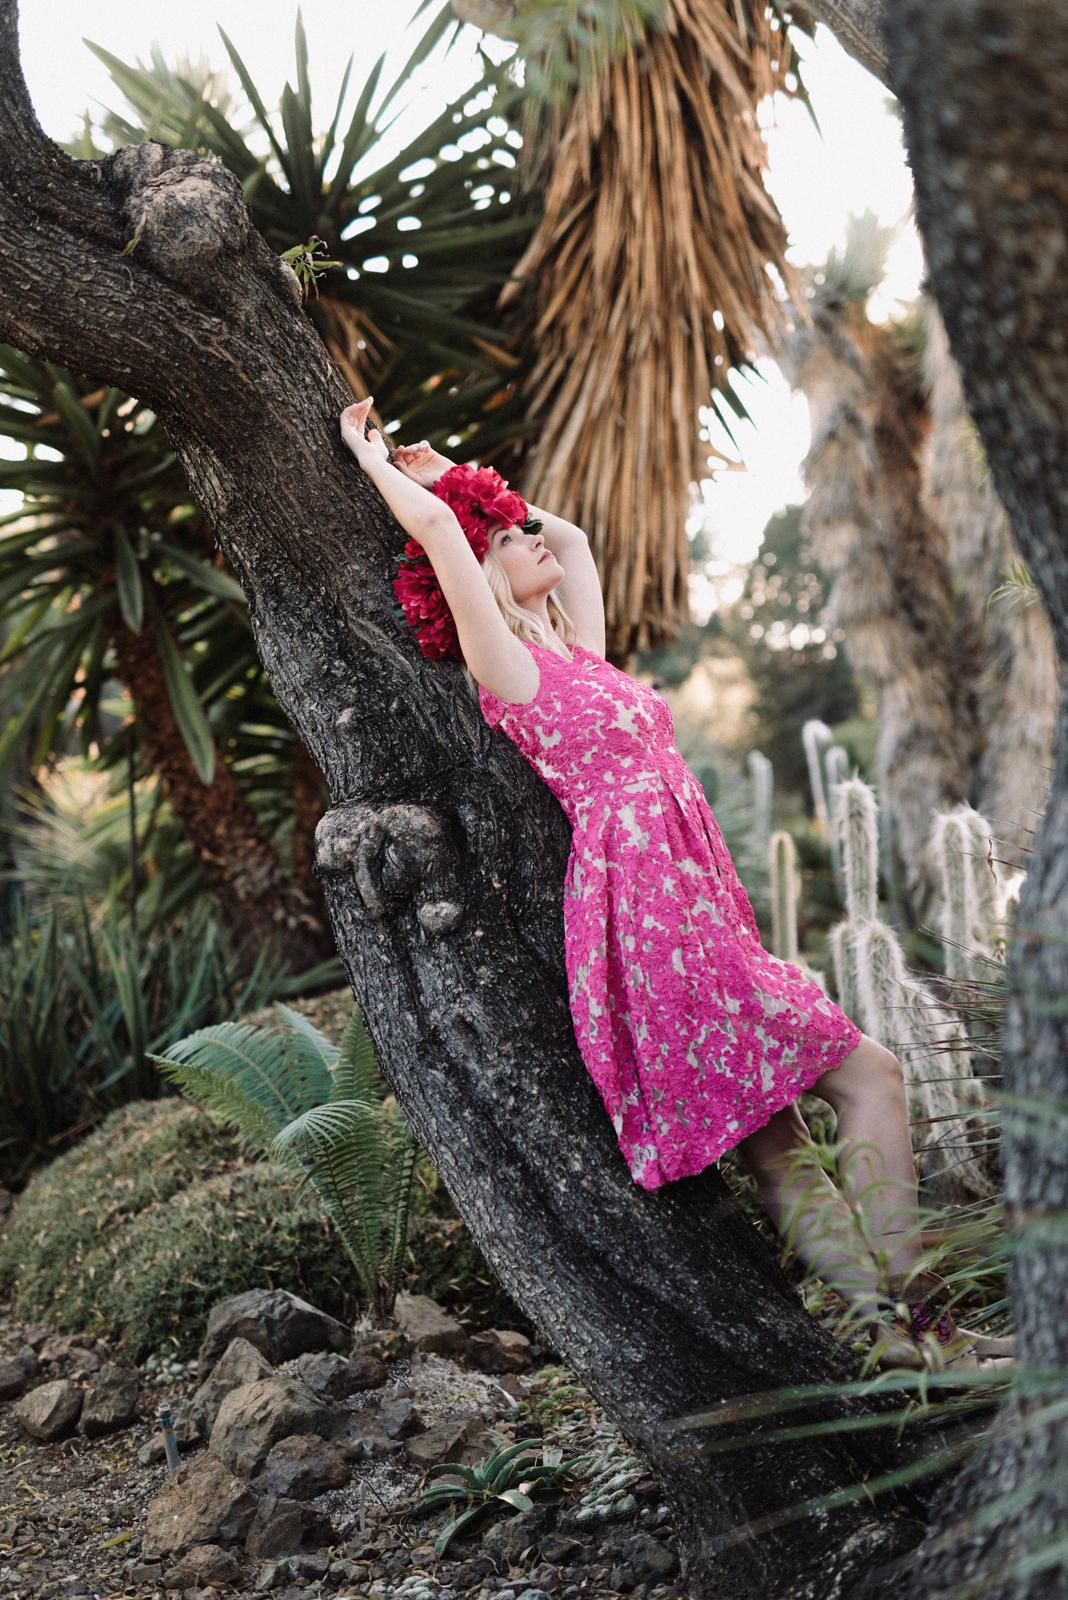 Caroline Alexander Photography | California High School Senior Photographer | High School Photos | Senior Portrait Photography | High School Senior Pictures | Lifestyle | Bay Area, California